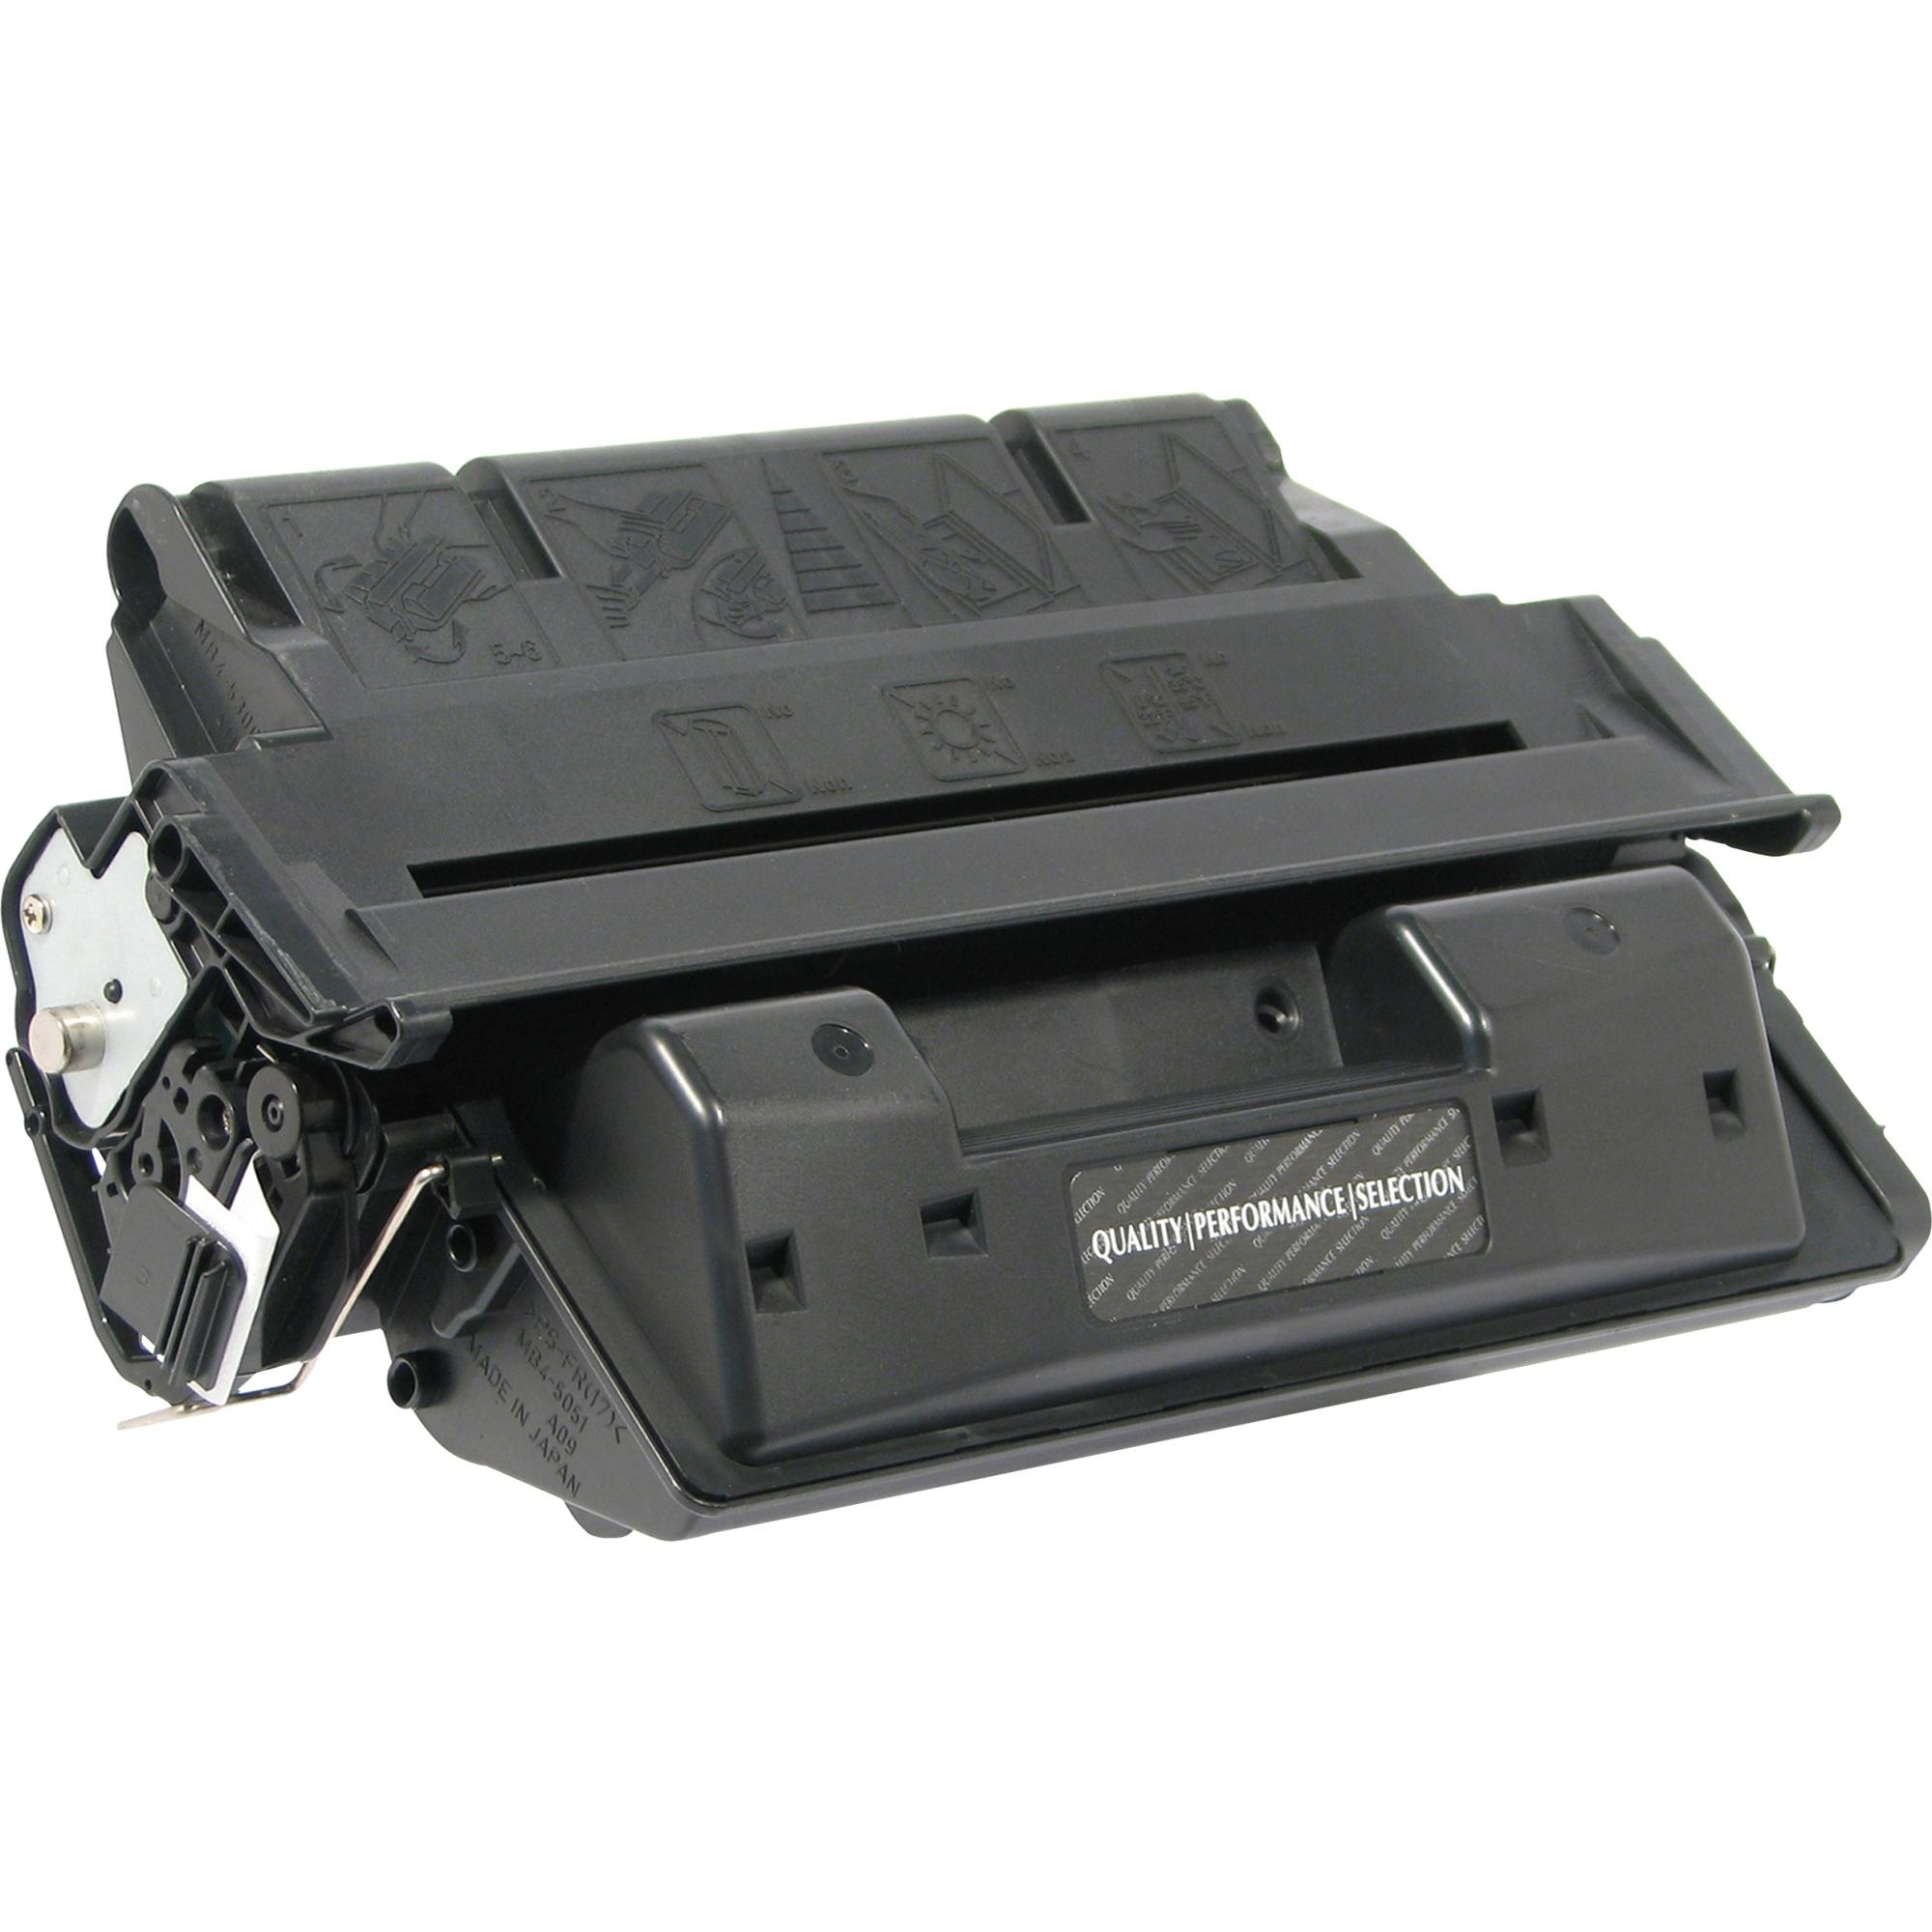 Black High Yield Toner Cartridge for HP LaserJet - Laser - High Yield - 10000 Page